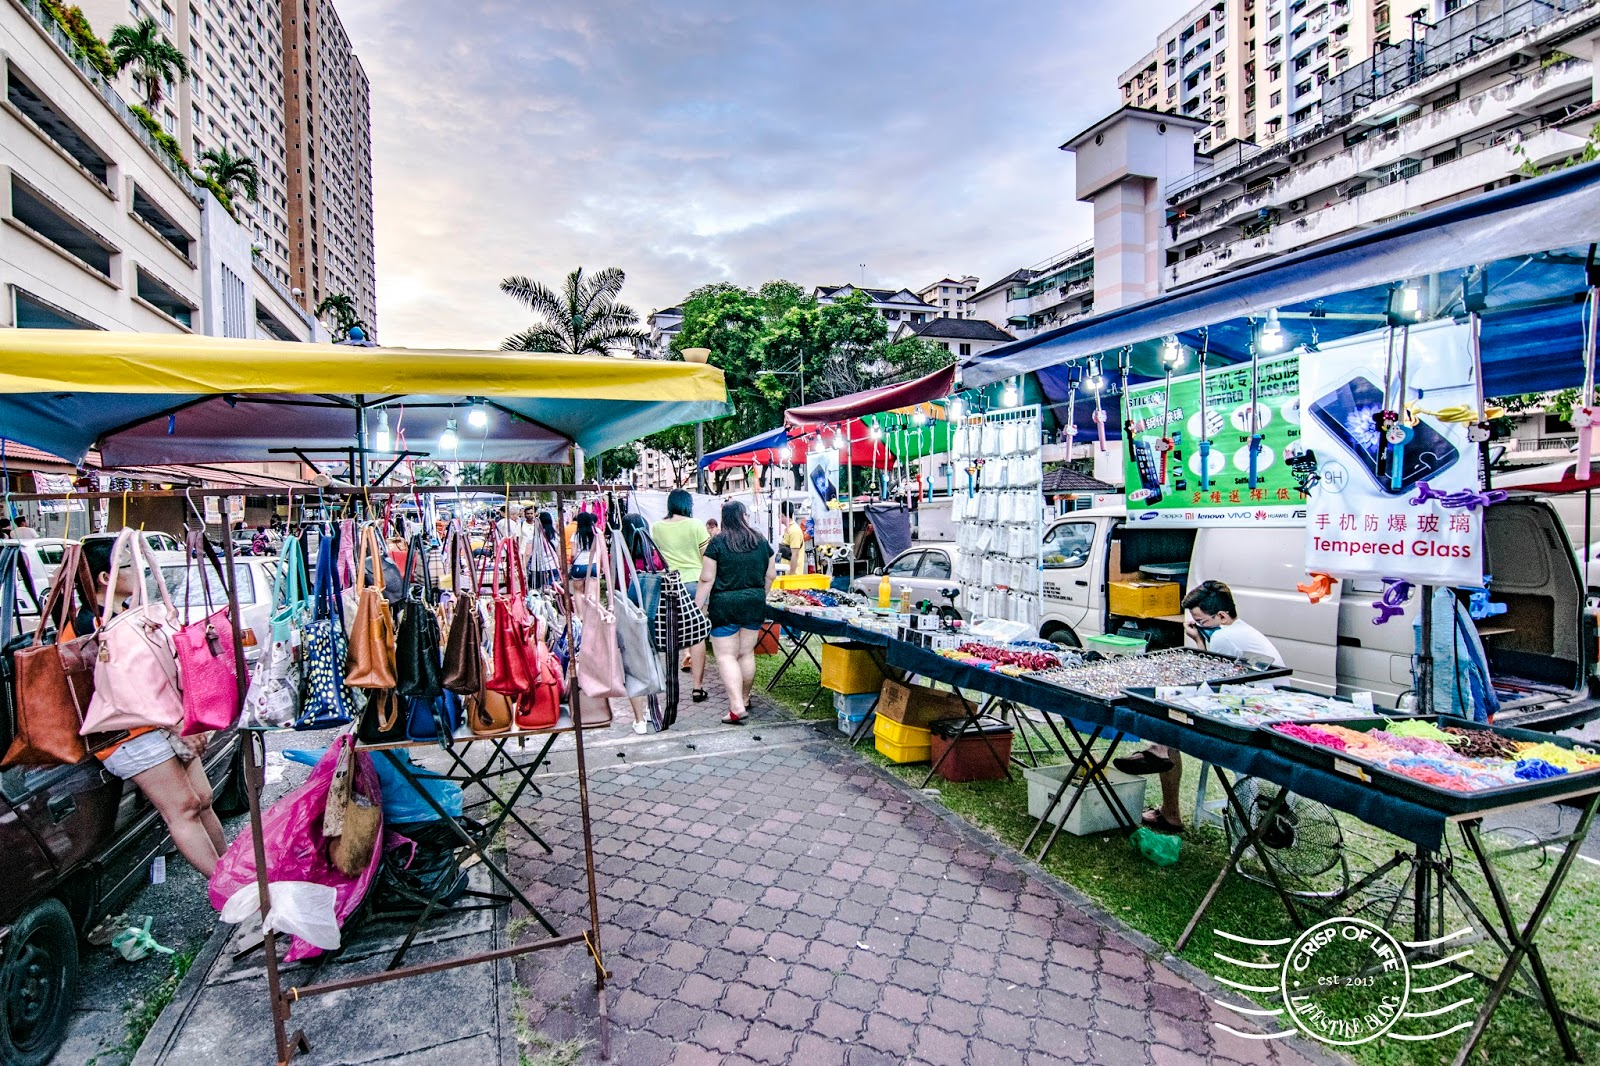 Perak Road Night Market on Every Friday @ Jalan Van Praagh Penang (Taman Kheng Tian), Penang